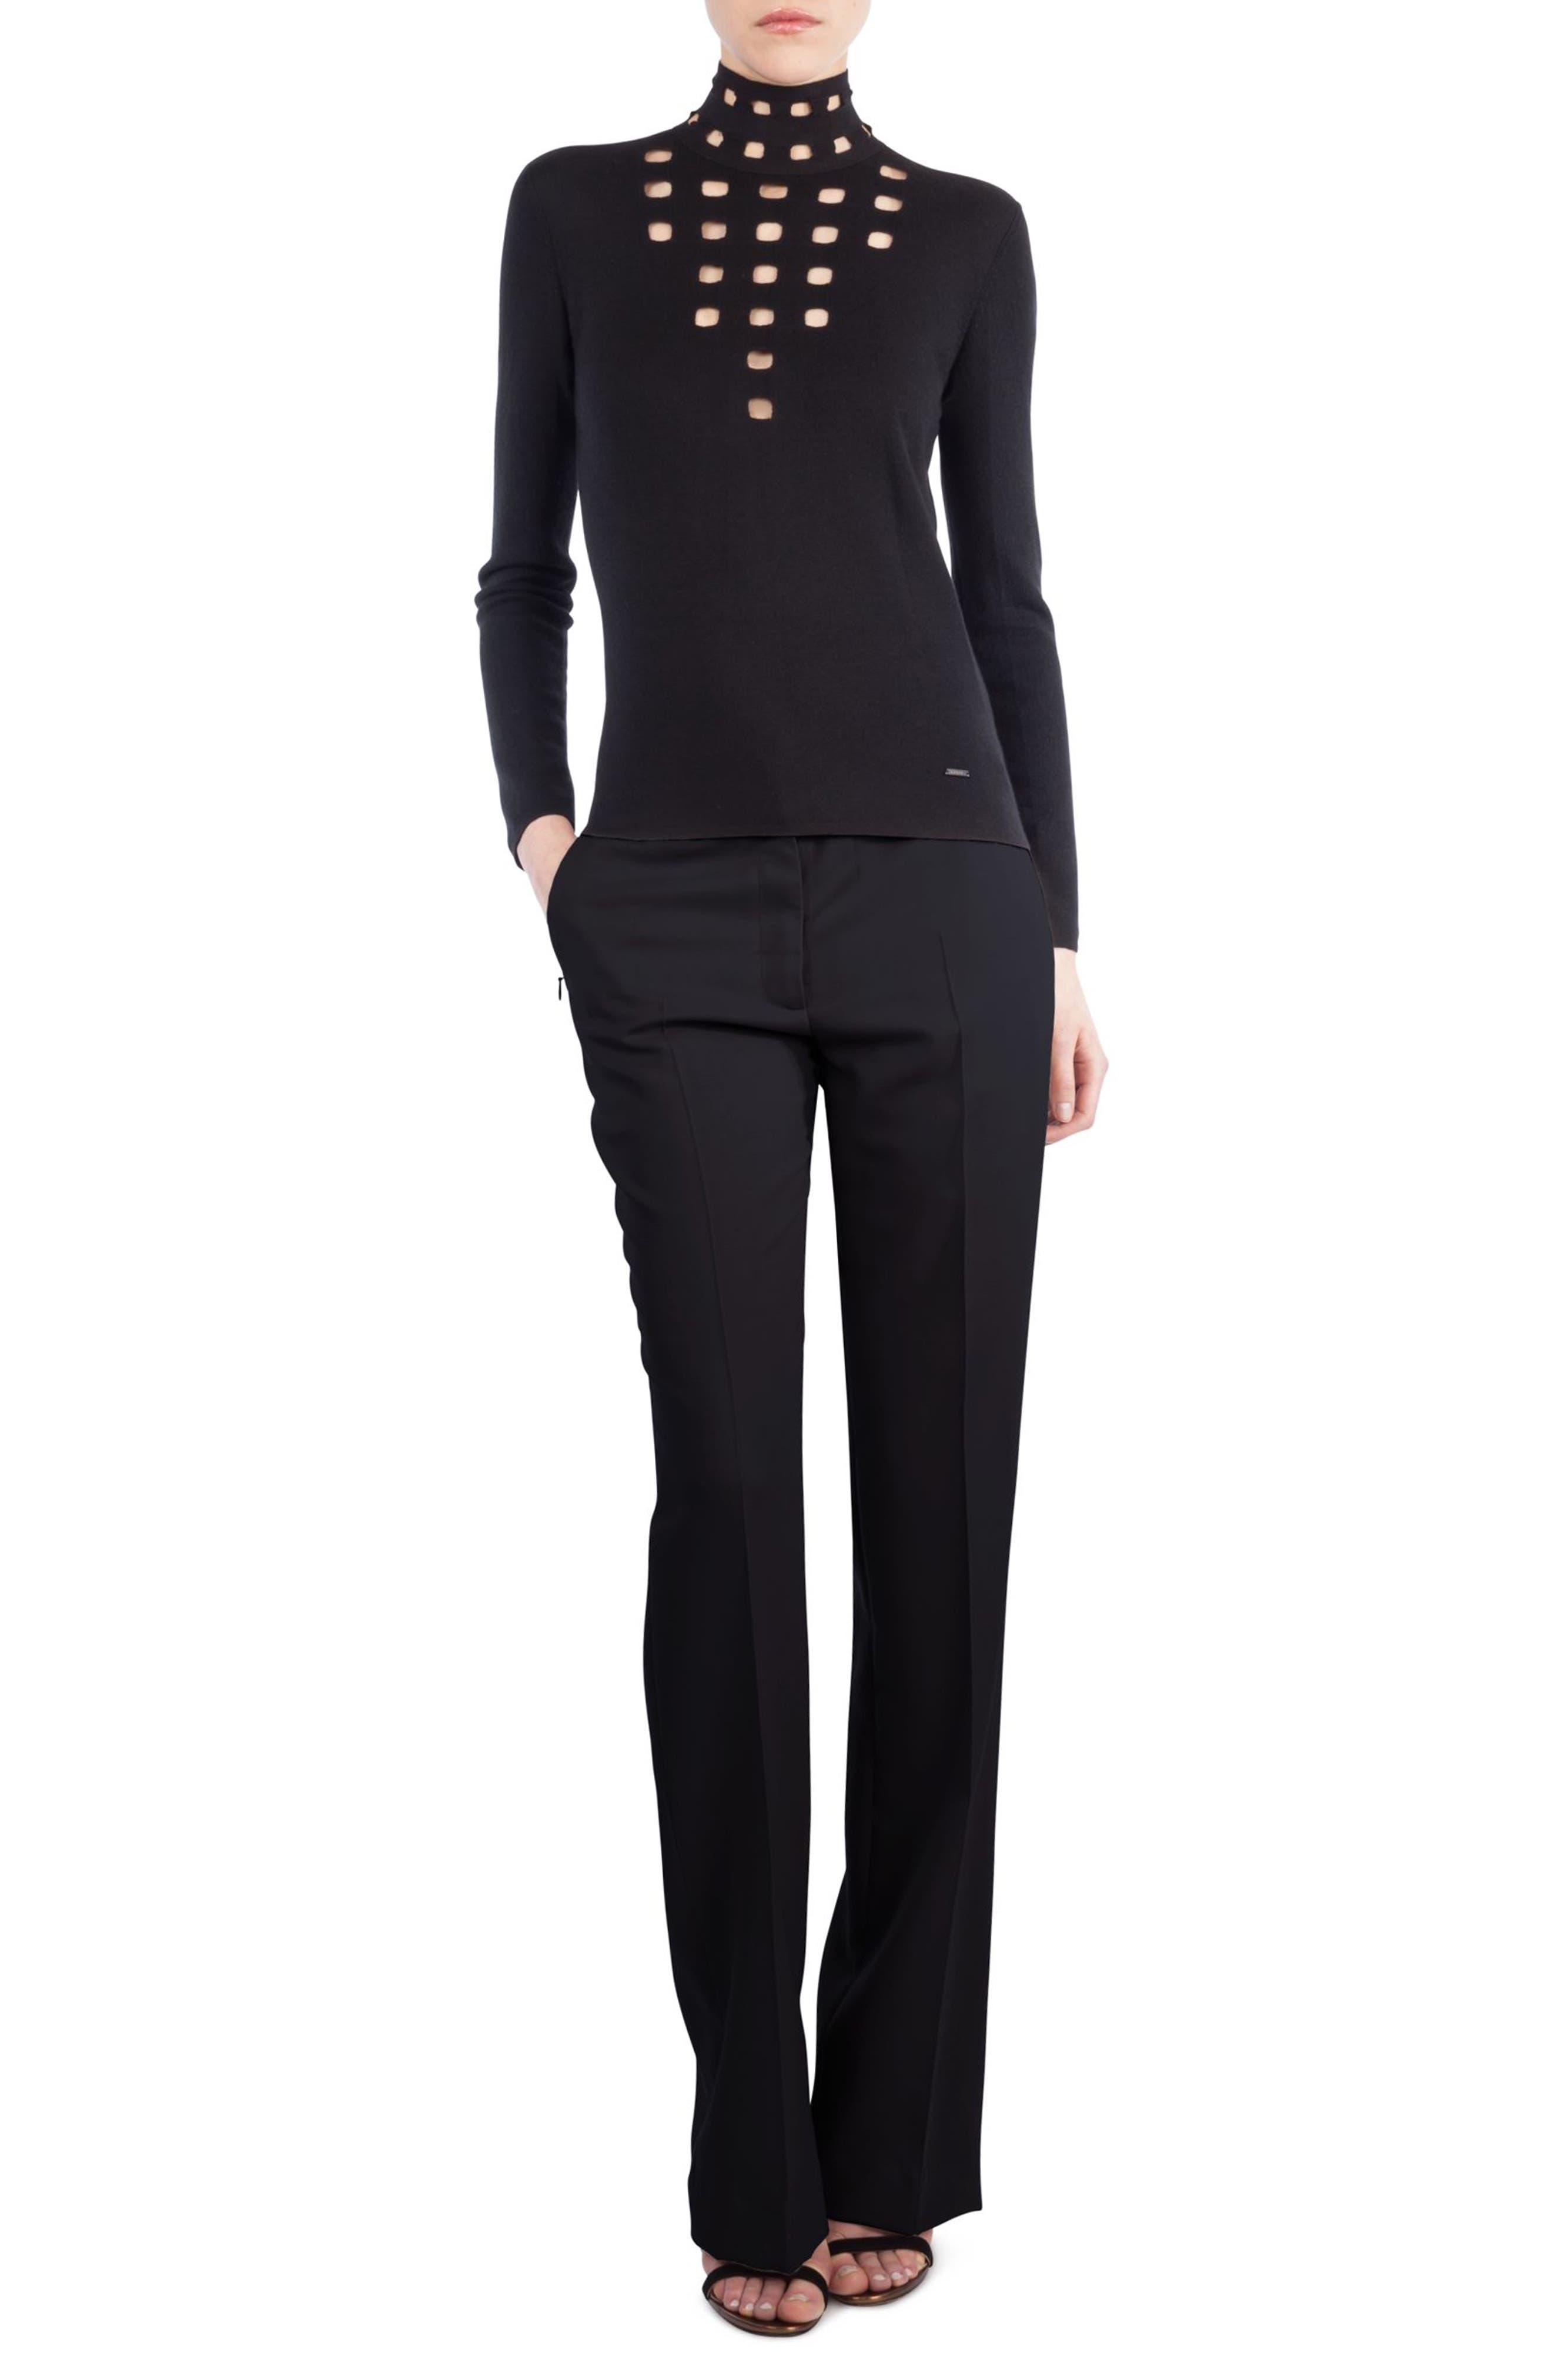 St. Gallen Cutout Cashmere & Silk Turtleneck Sweater,                         Main,                         color, 009